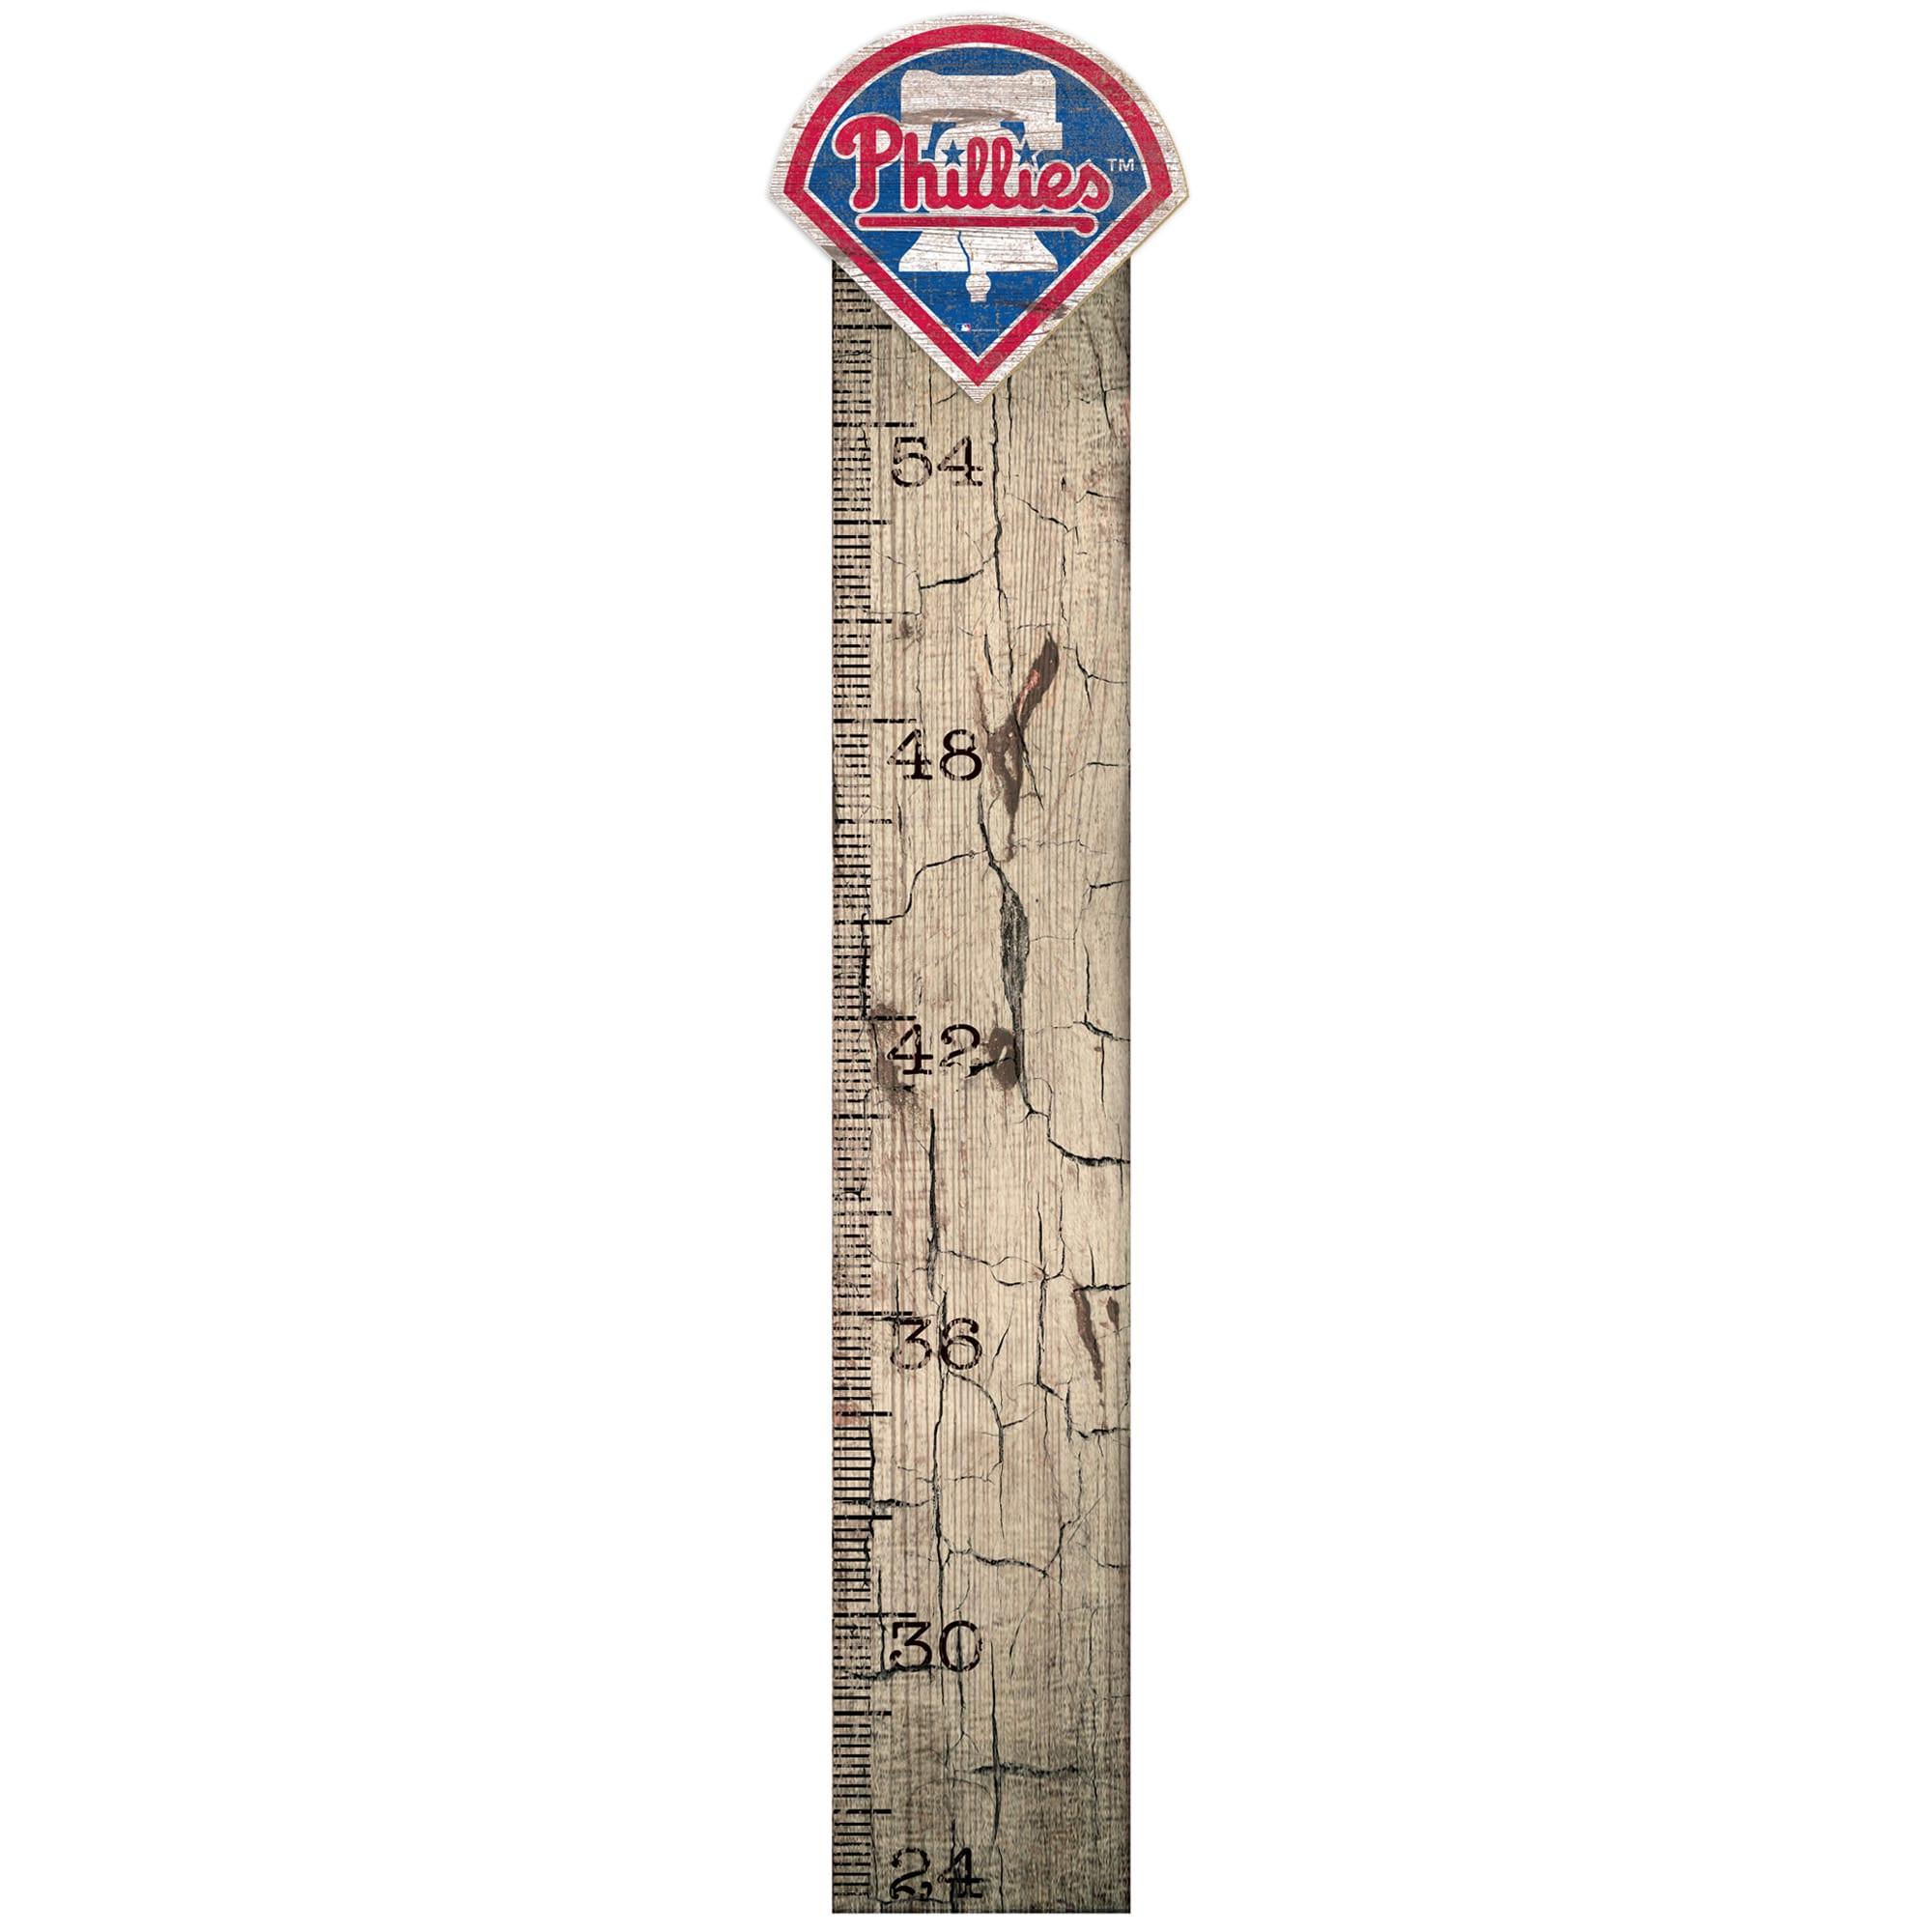 "Philadelphia Phillies 6"" x 36"" Growth Chart Sign"